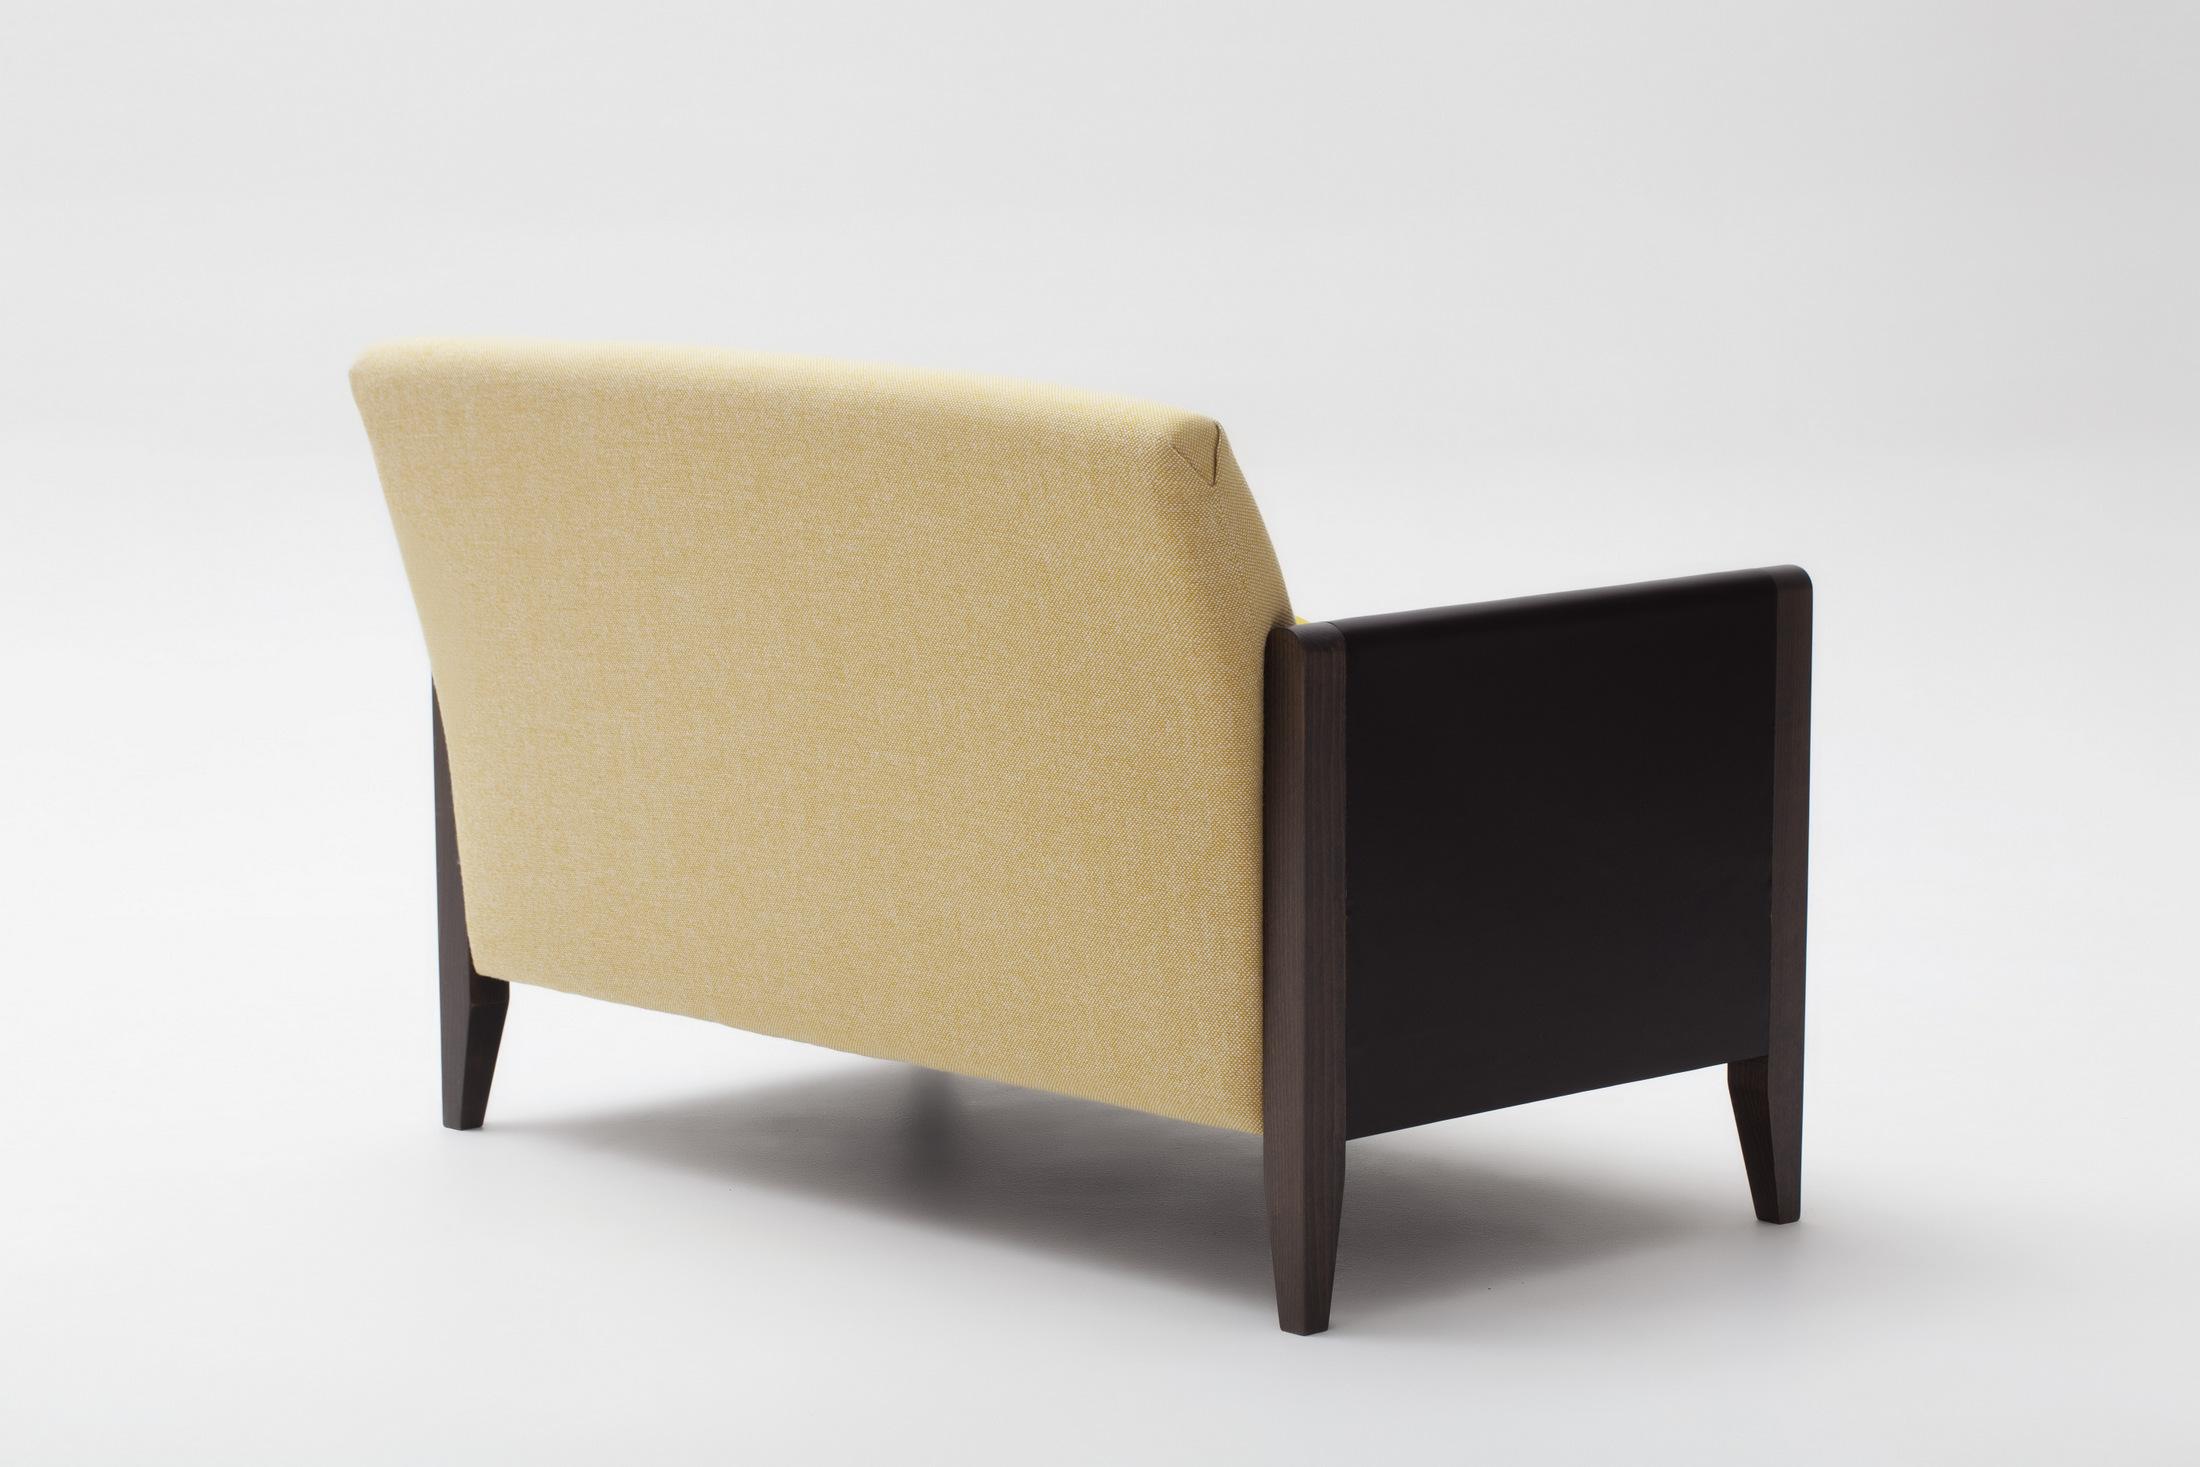 Resident Sofa by Adentrofa by Adentro